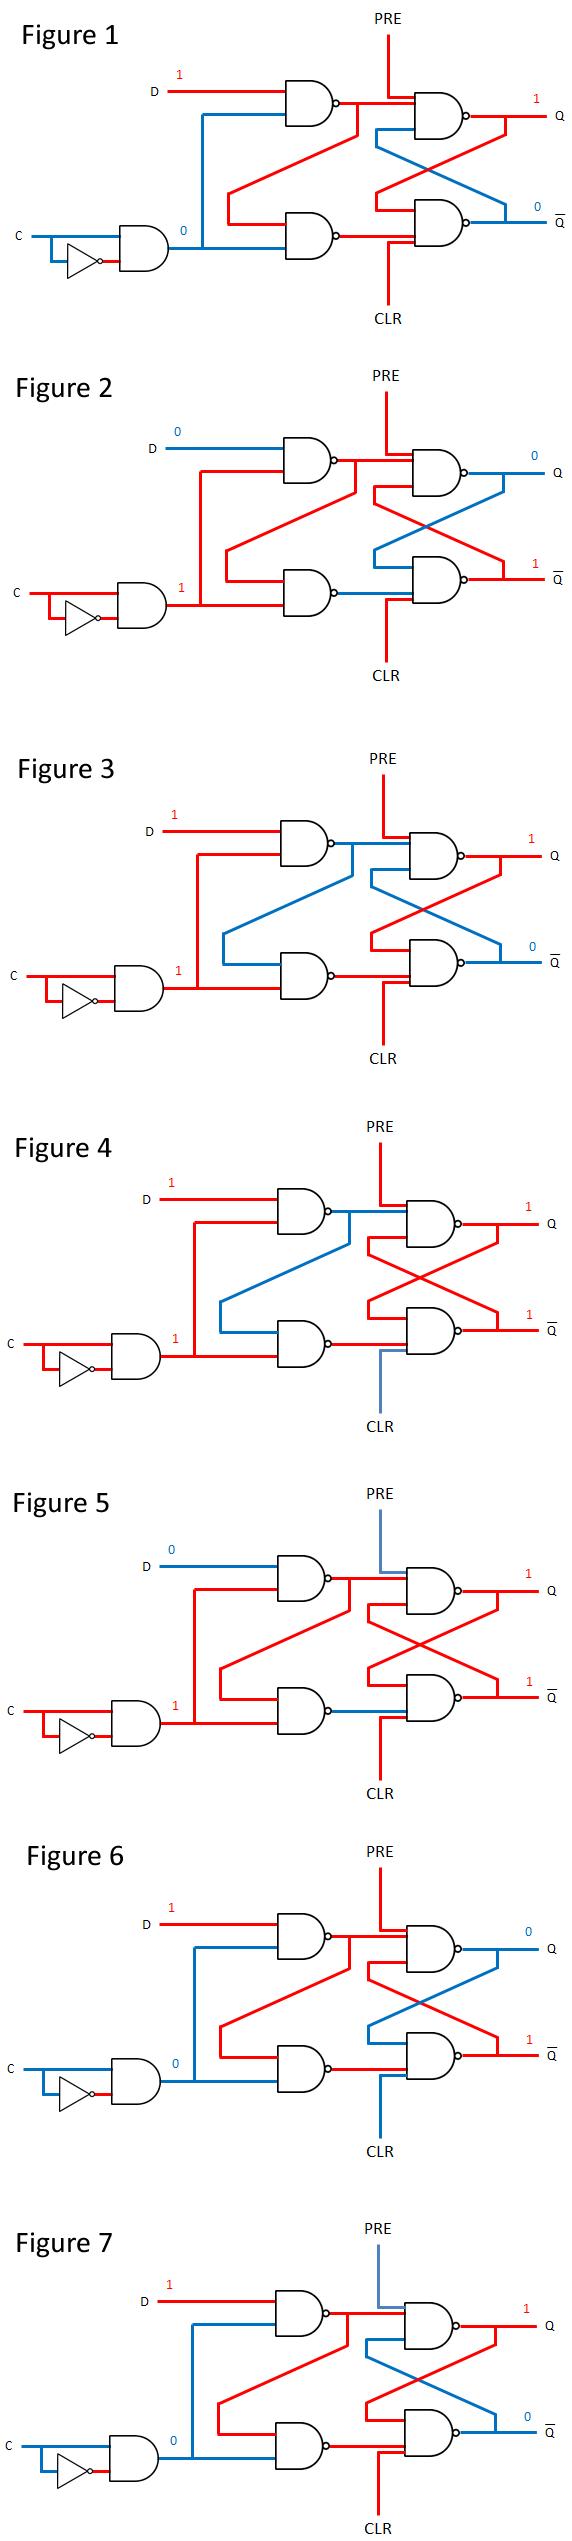 medium resolution of enter image description here digital logic circuit analysis integrated circuit flipflop latch